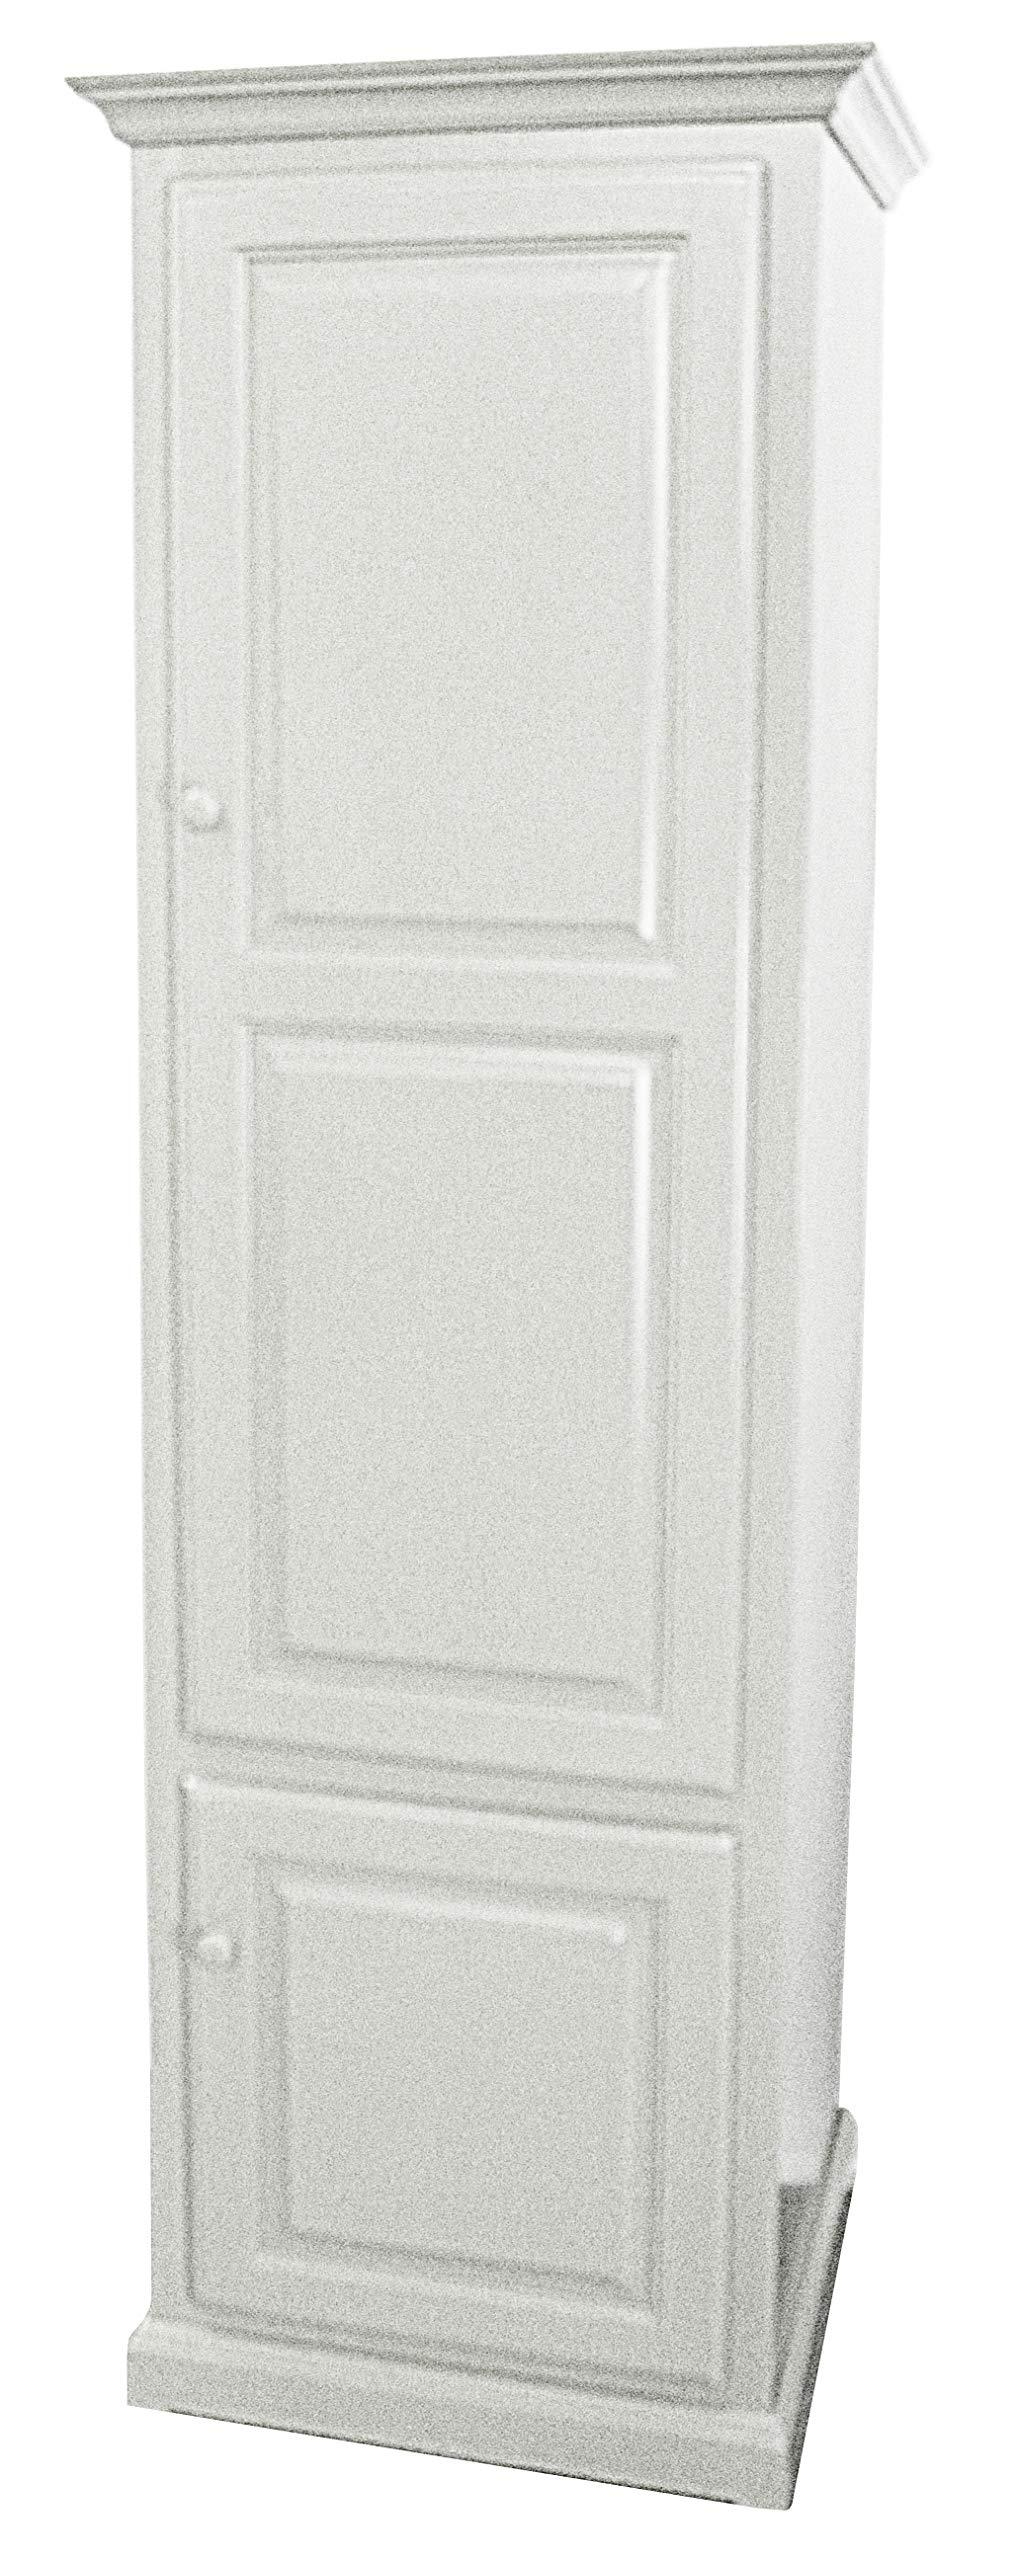 American Heartland Poplar Single Door Pantry, Bright White by American Heartland MFG.